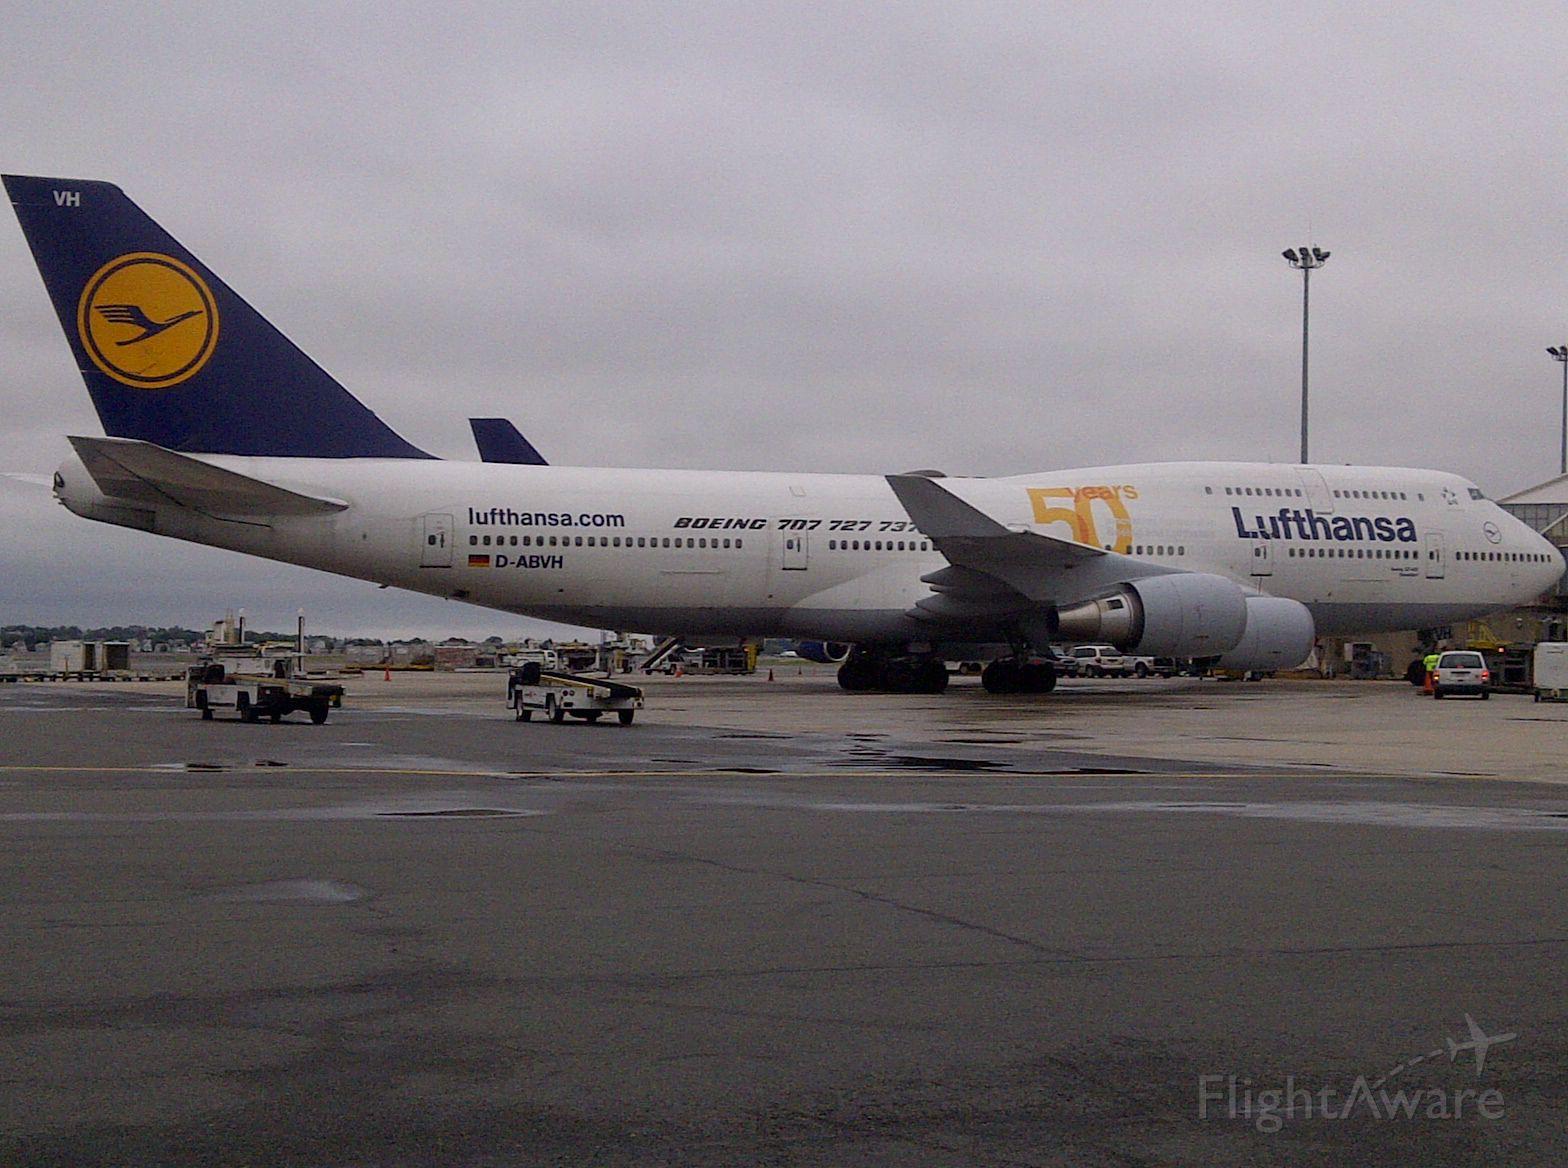 Boeing 747-400 (D-ABVH)